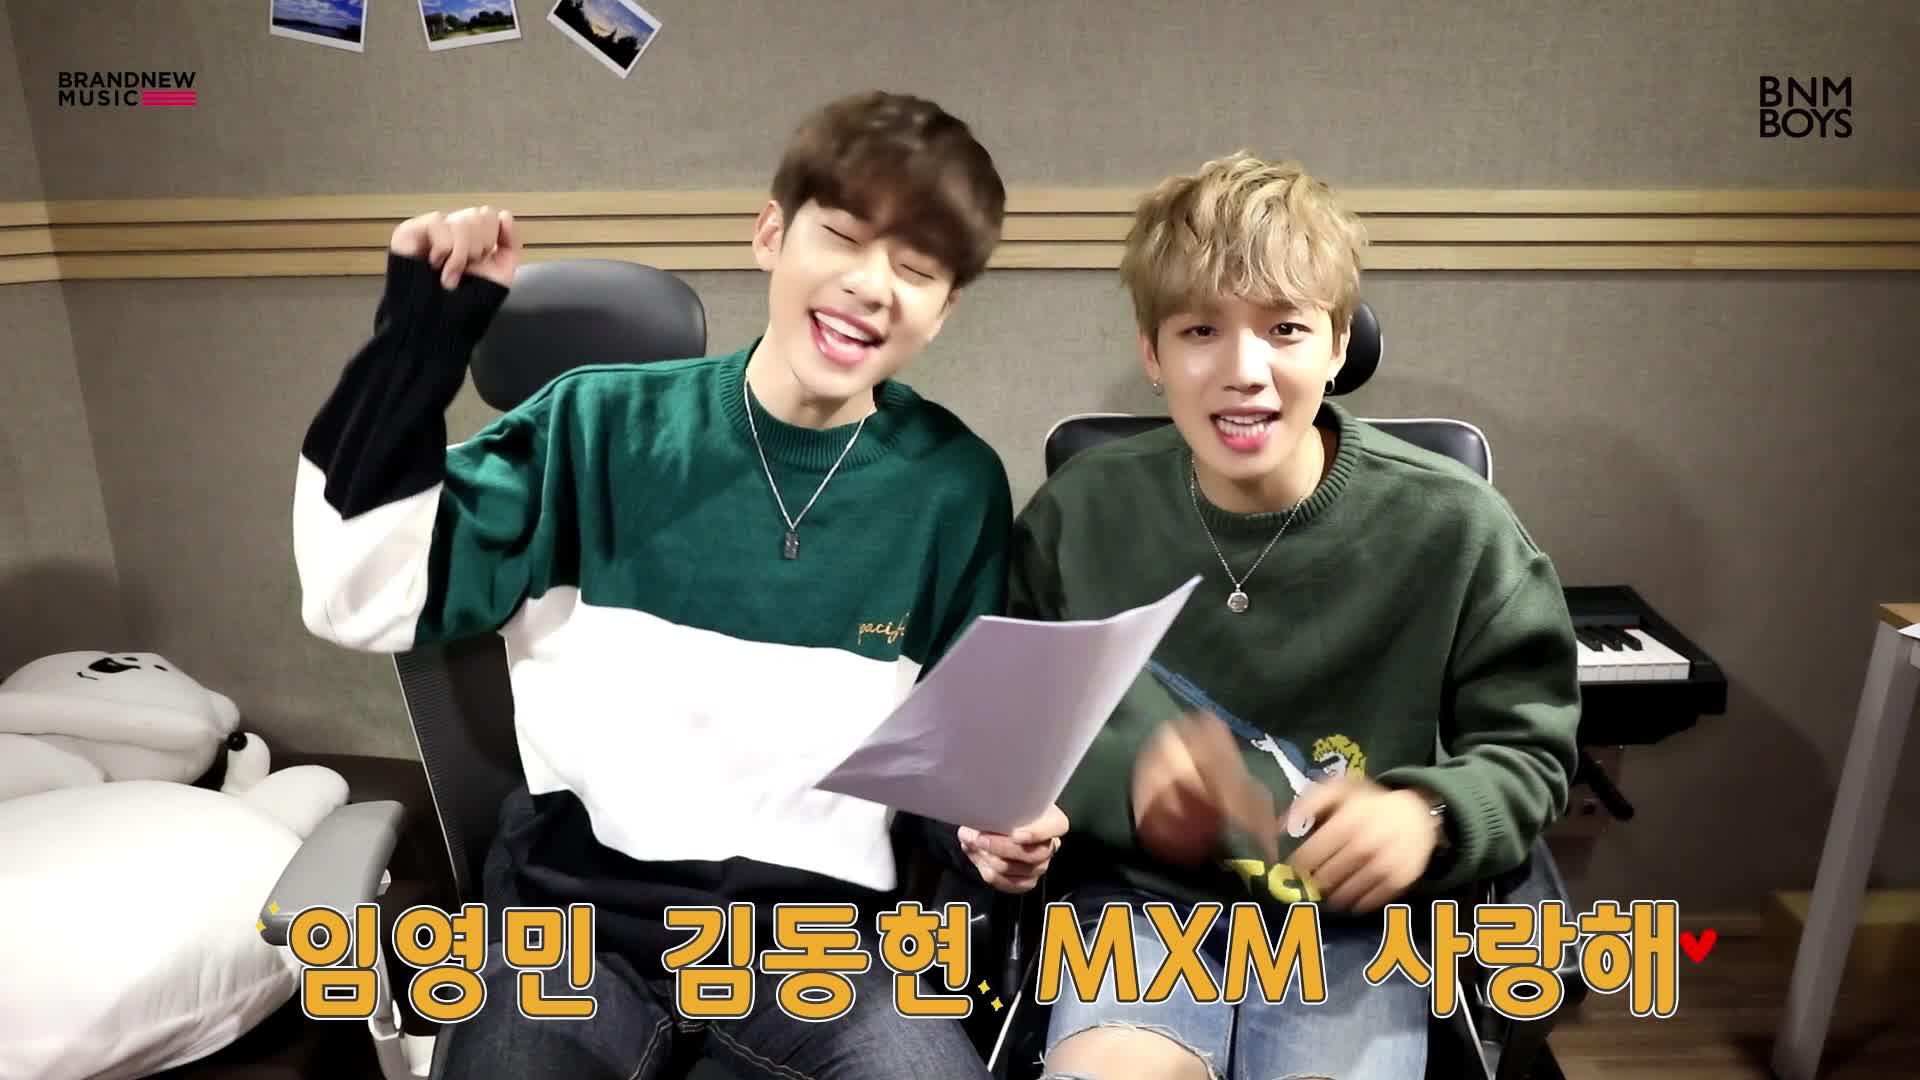 MXM (BRANDNEW BOYS) – 다이아몬드걸 응원법 가이드 영상